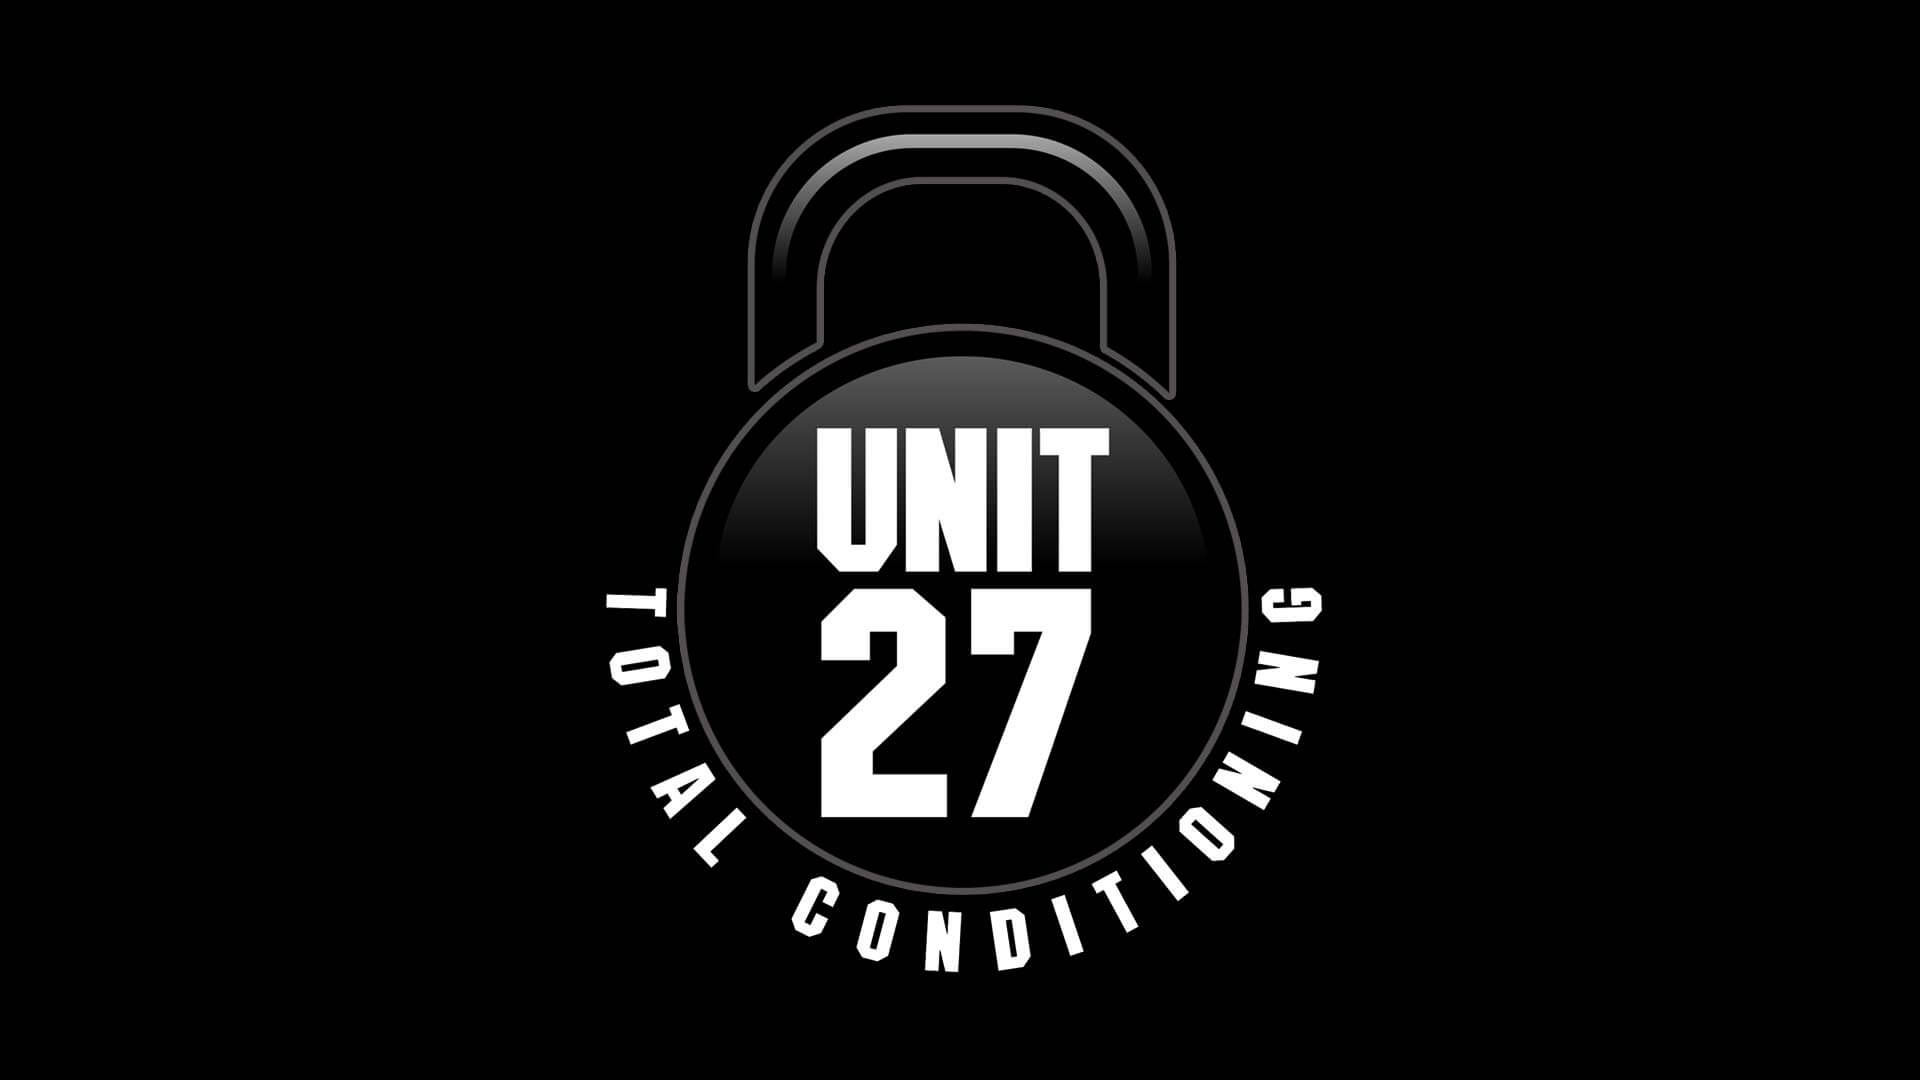 Where is the Phuket Unit 27 website?